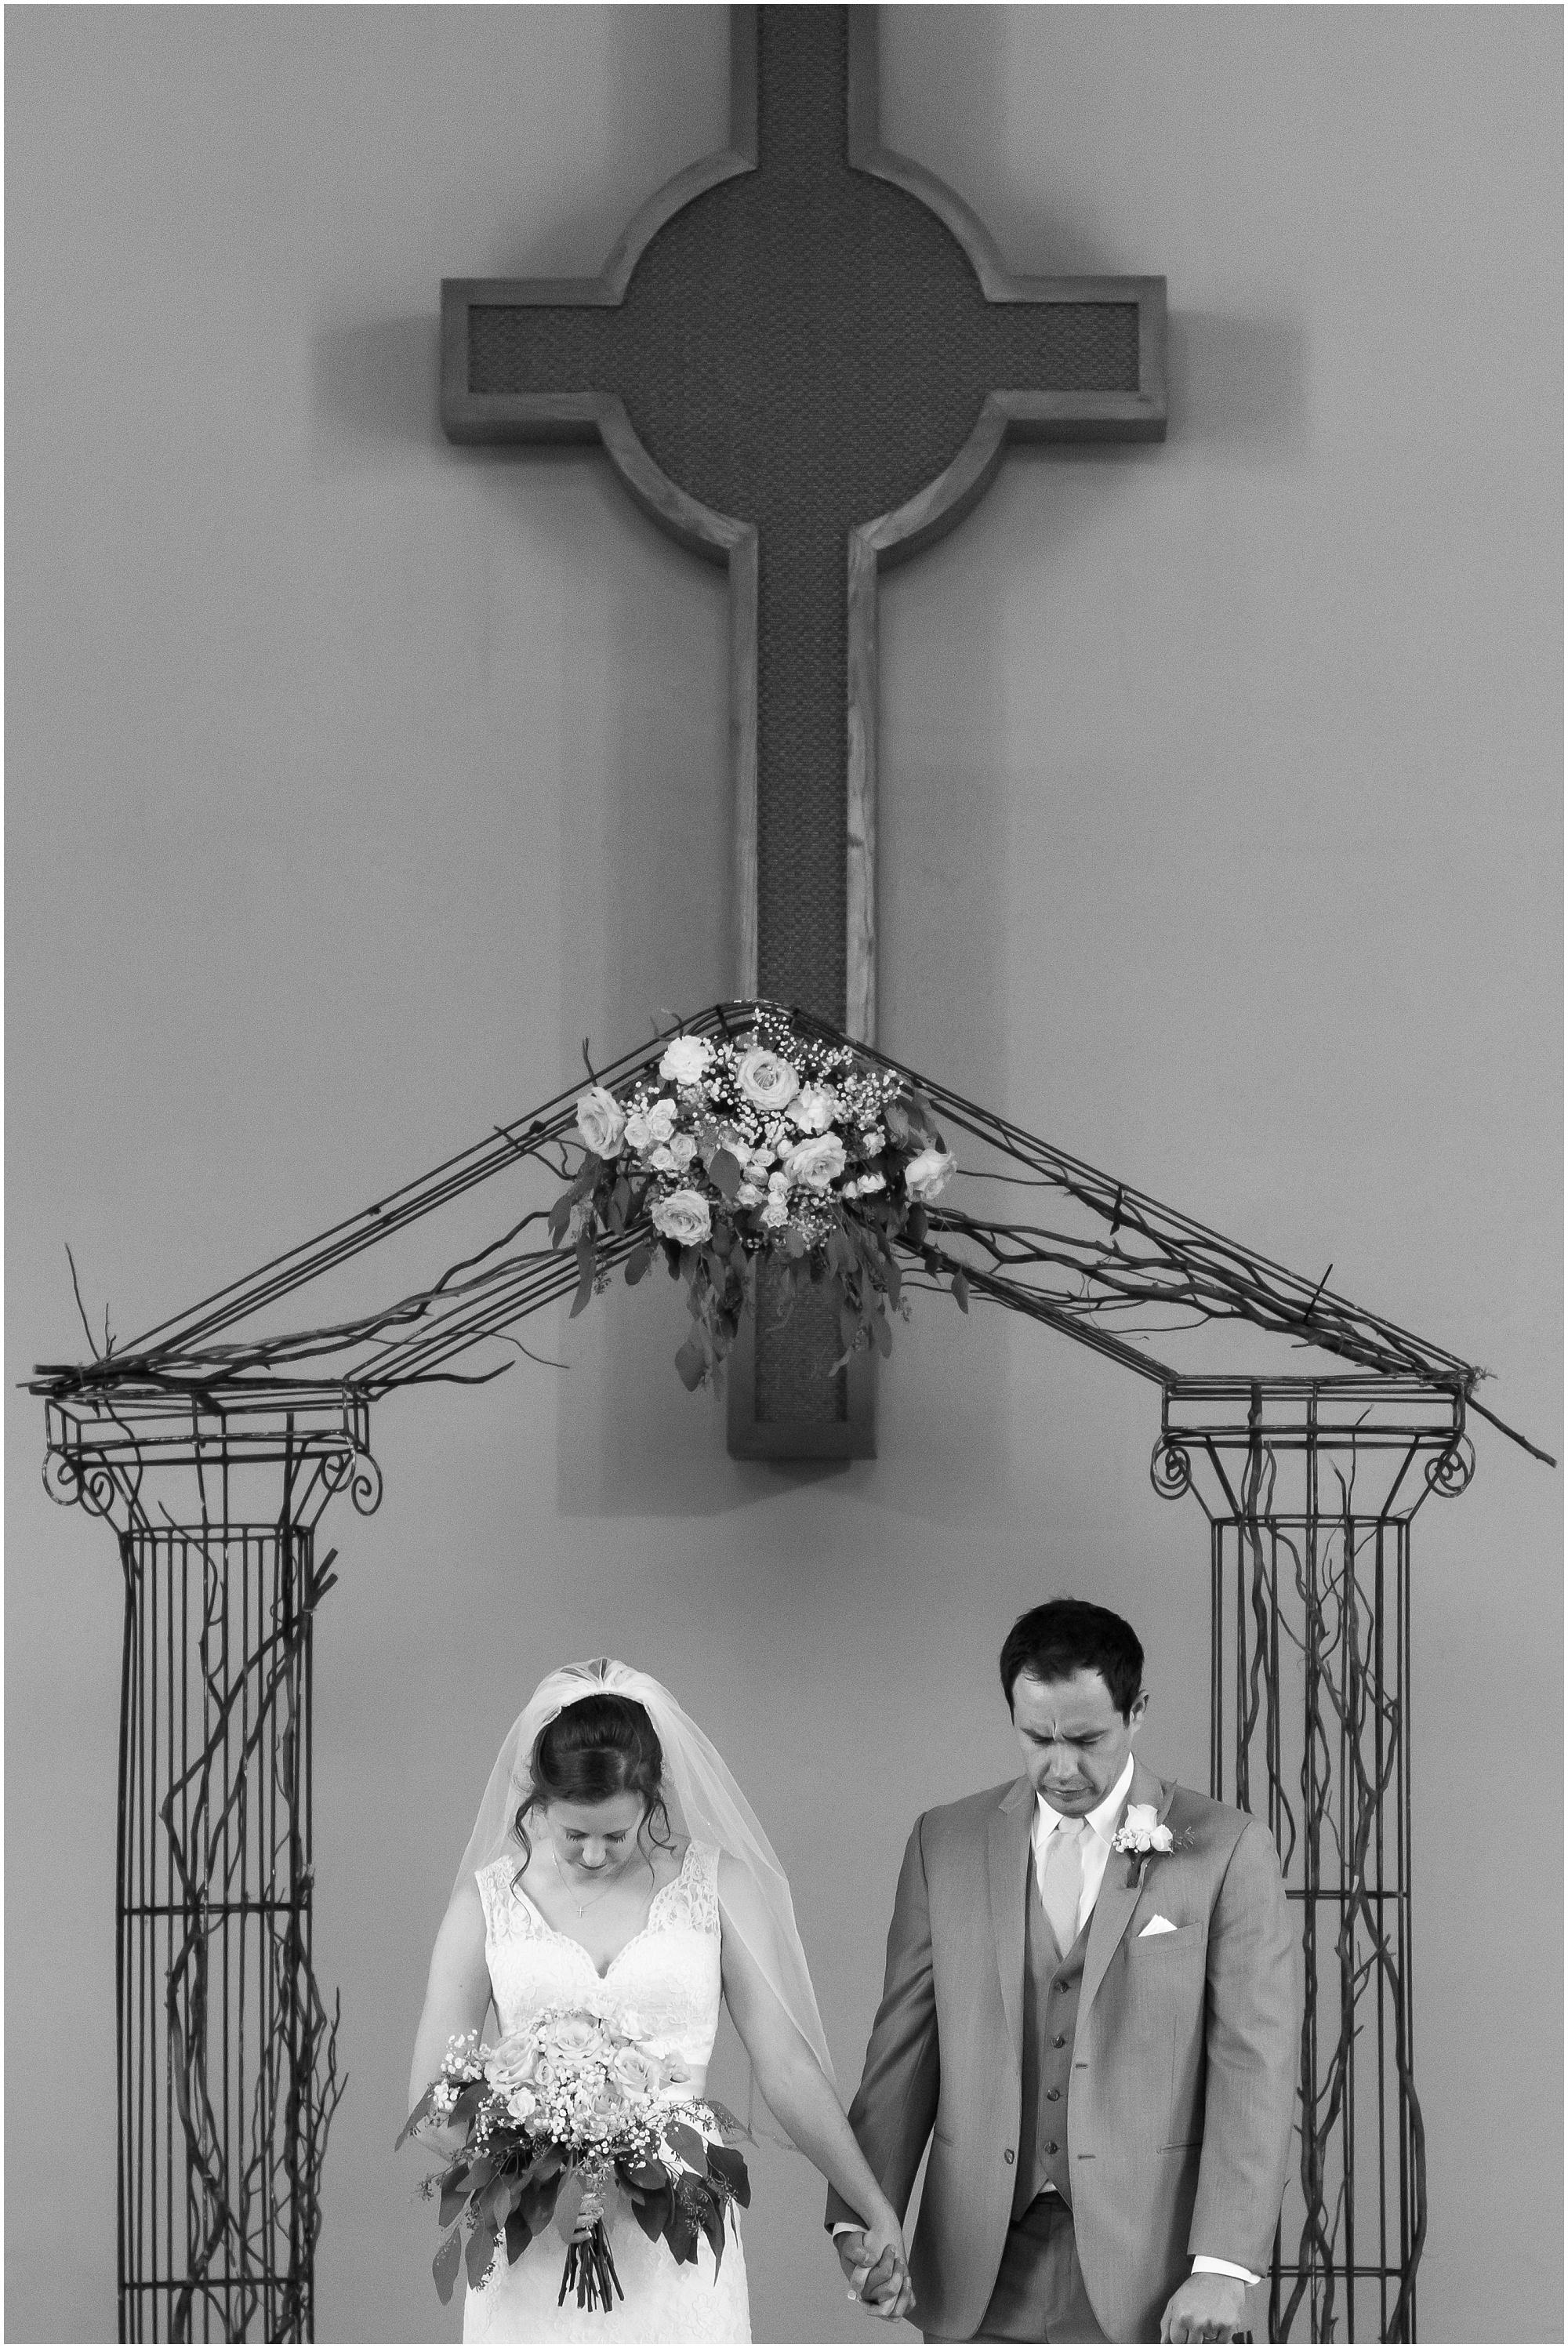 Bride and groom praying at the altar - Jason & Melaina Photography - www.jasonandmelaina.com